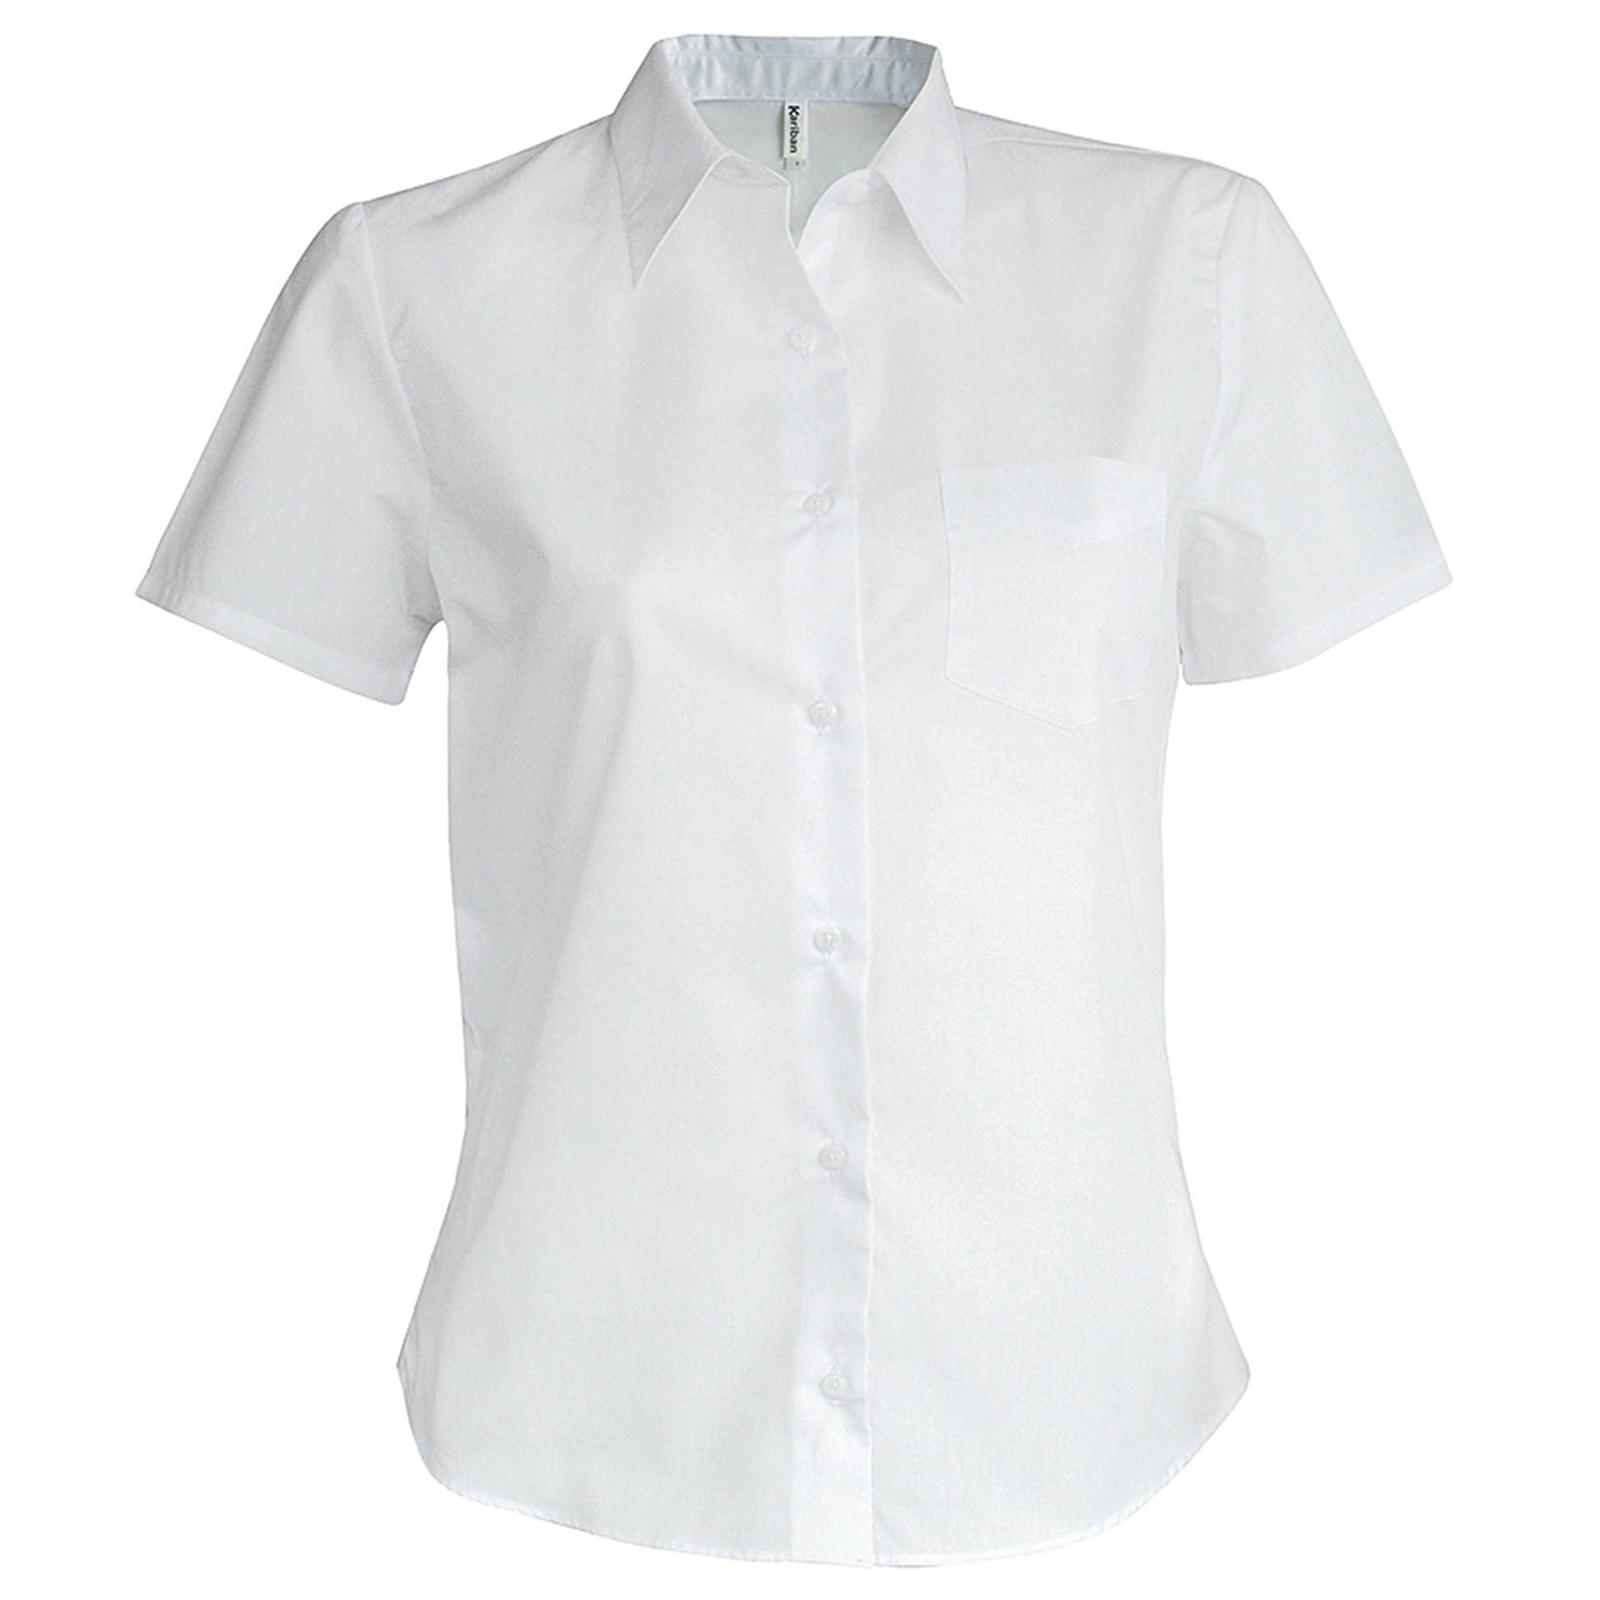 New Kariban Womens Ladies Casual Short Sleeve Oxford Shirt